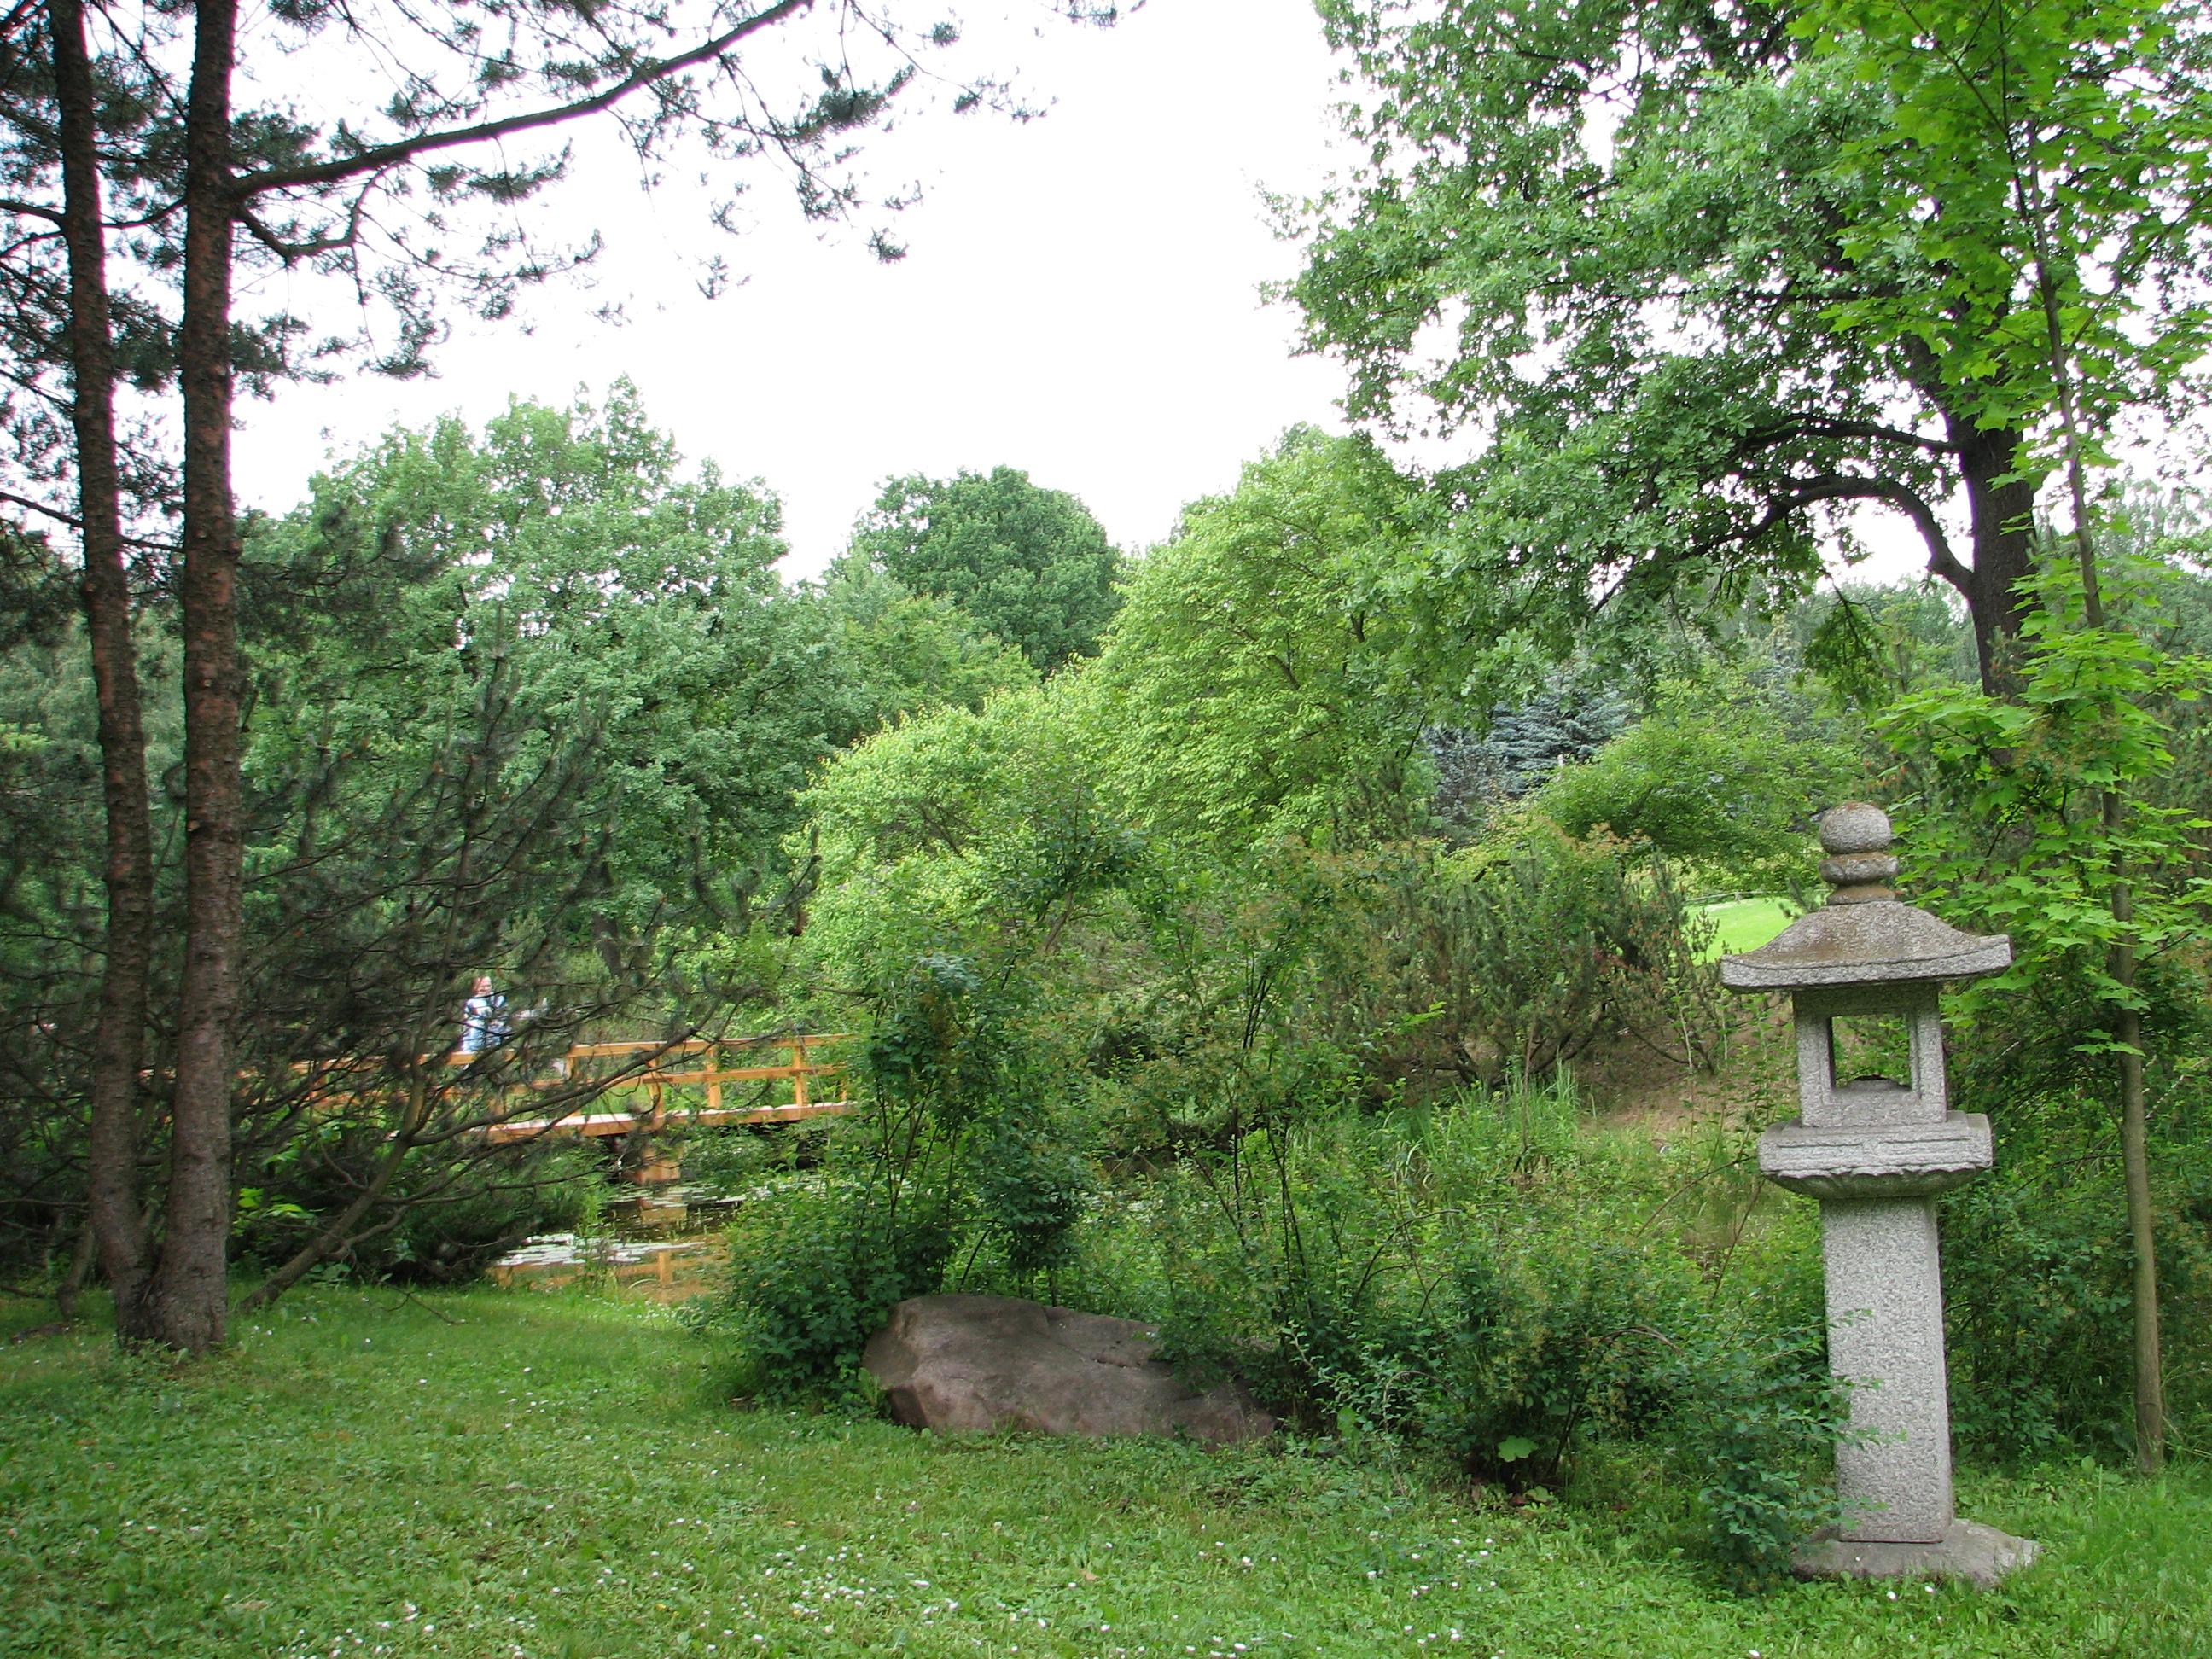 Японский сад москва 26 фотография